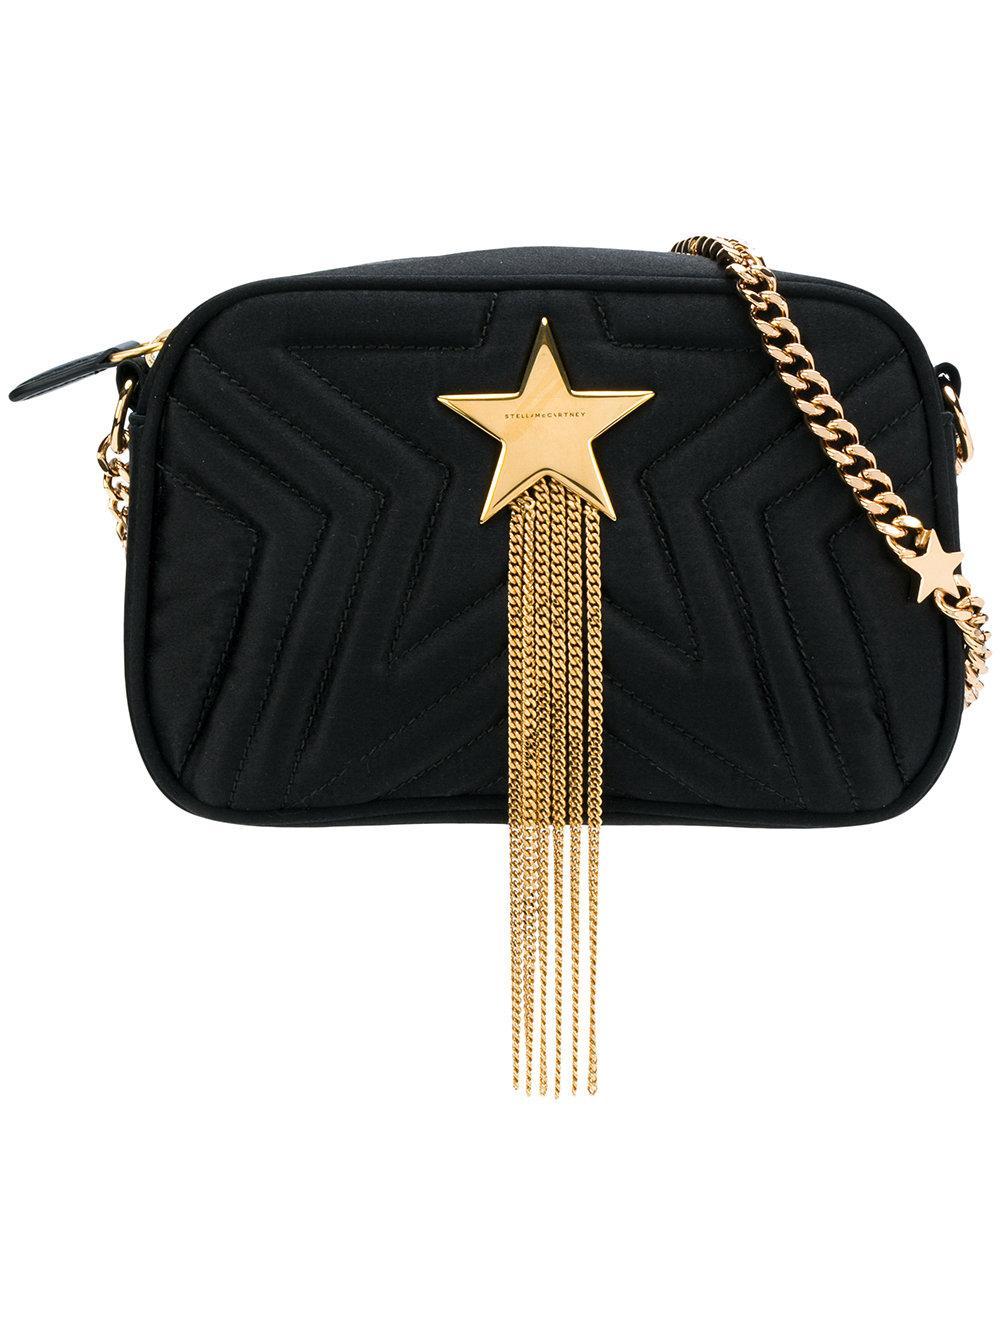 bc88b417a852 Stella Mccartney Mini Star Quilted Satin Camera Bag - Black